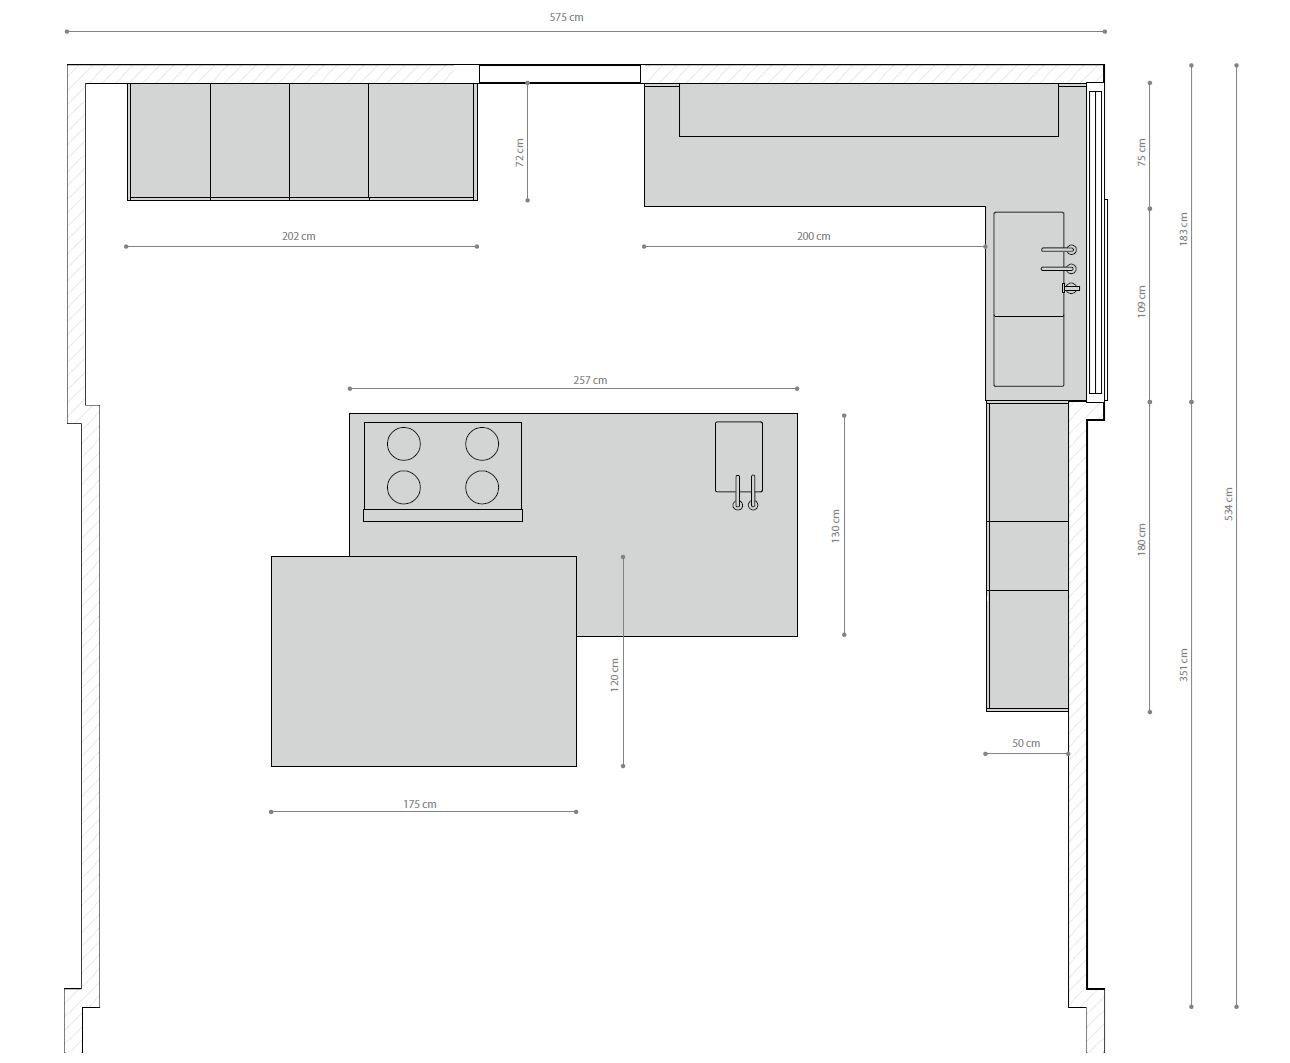 Dimensioni T30 / D90 | Cucina con isola | Cucine, Cucine ...